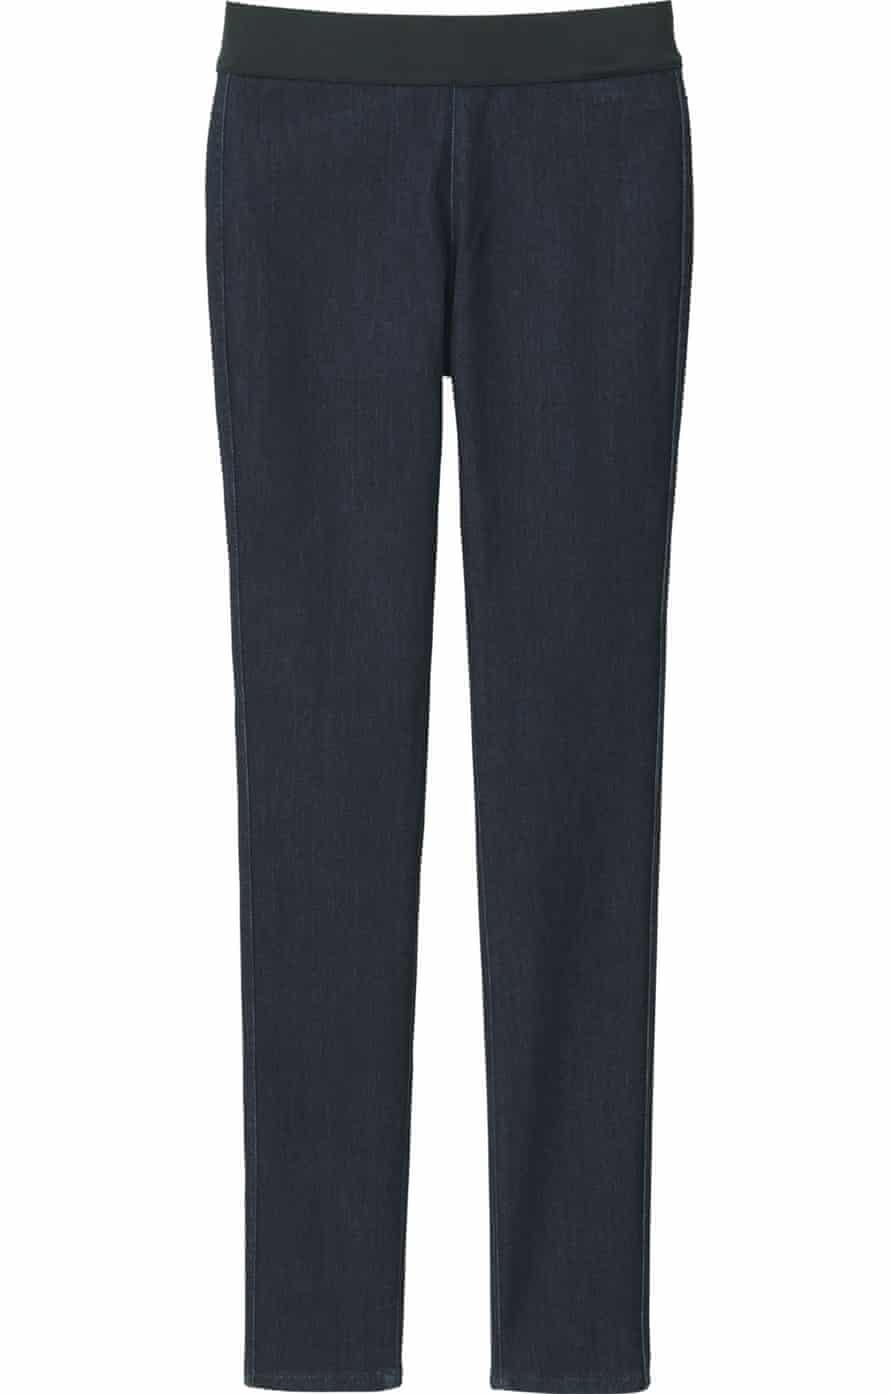 Denima Yoga pants from Uniqlo